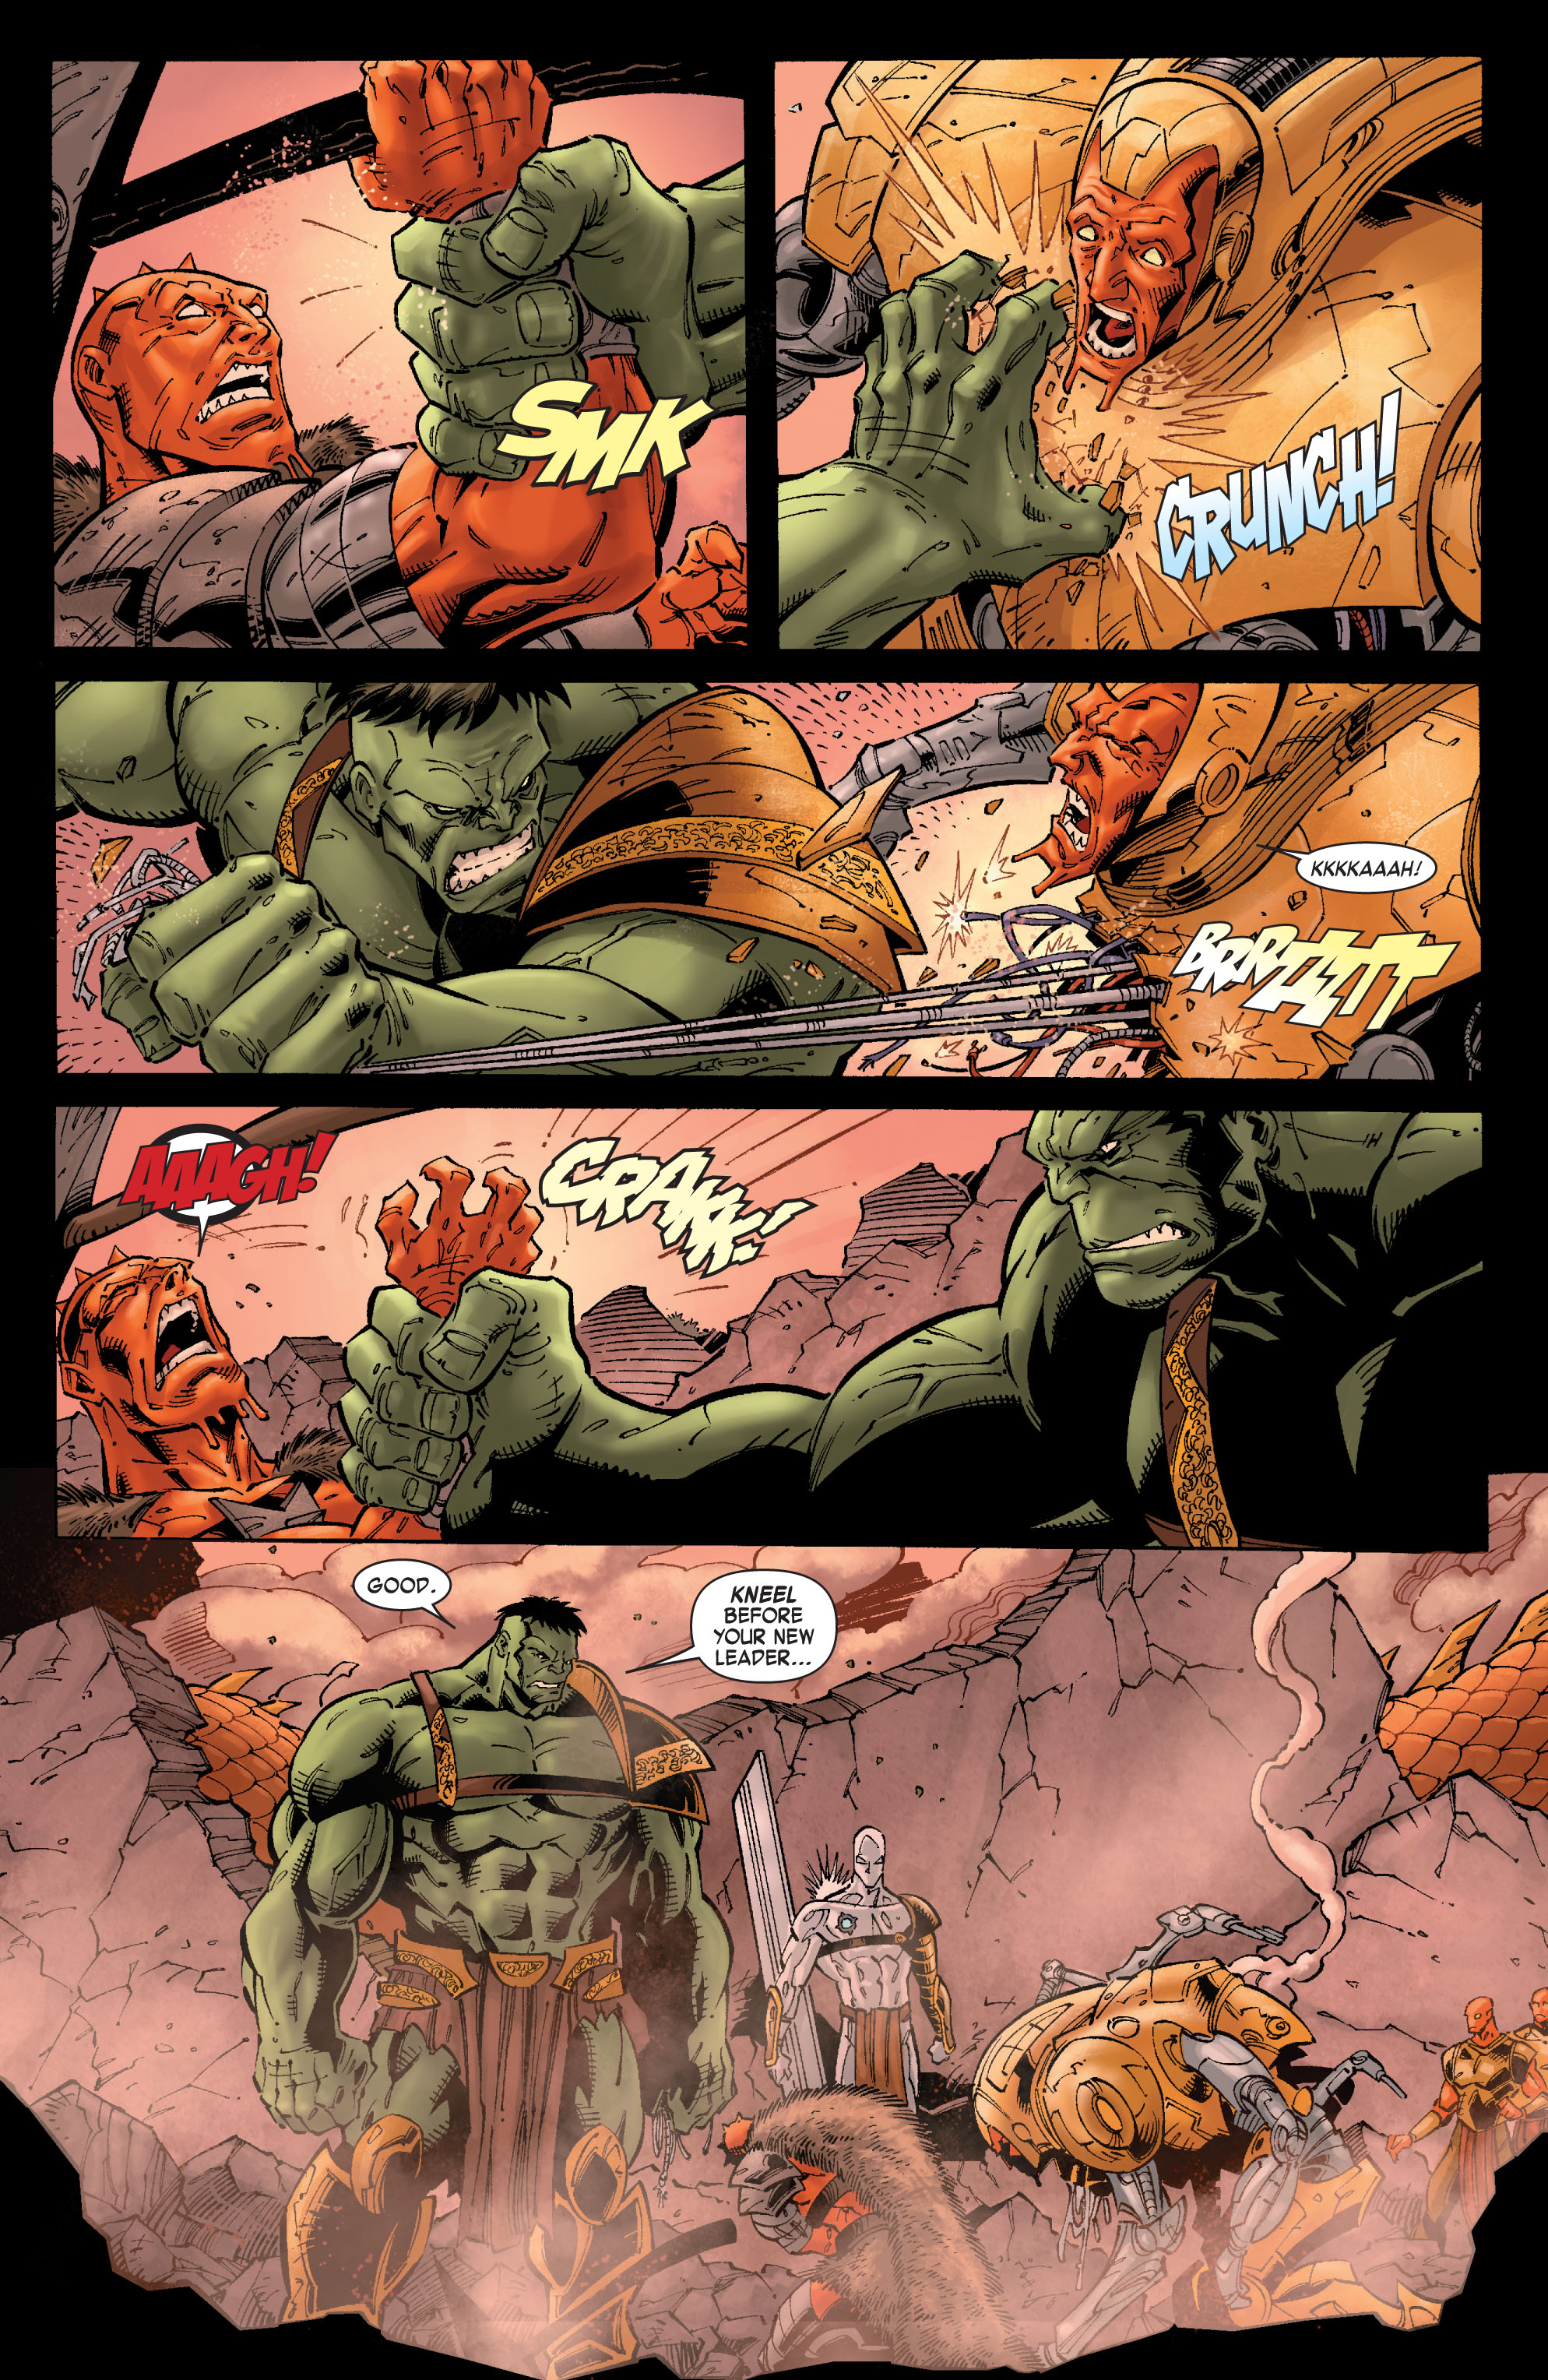 Read online Skaar: Son of Hulk comic -  Issue #9 - 12